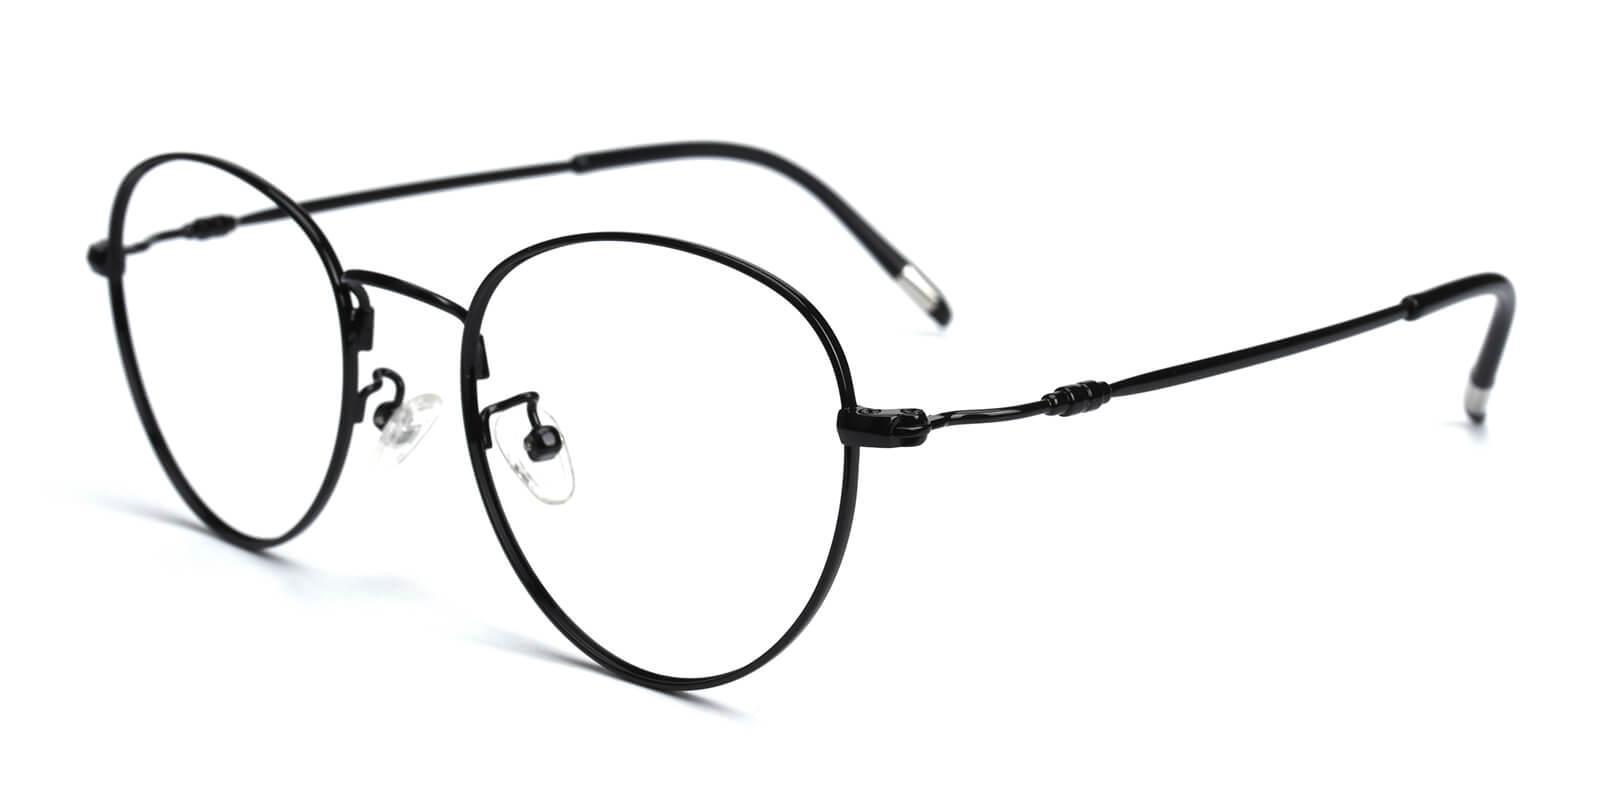 Sadie-Black-Round-Metal-Eyeglasses-additional1